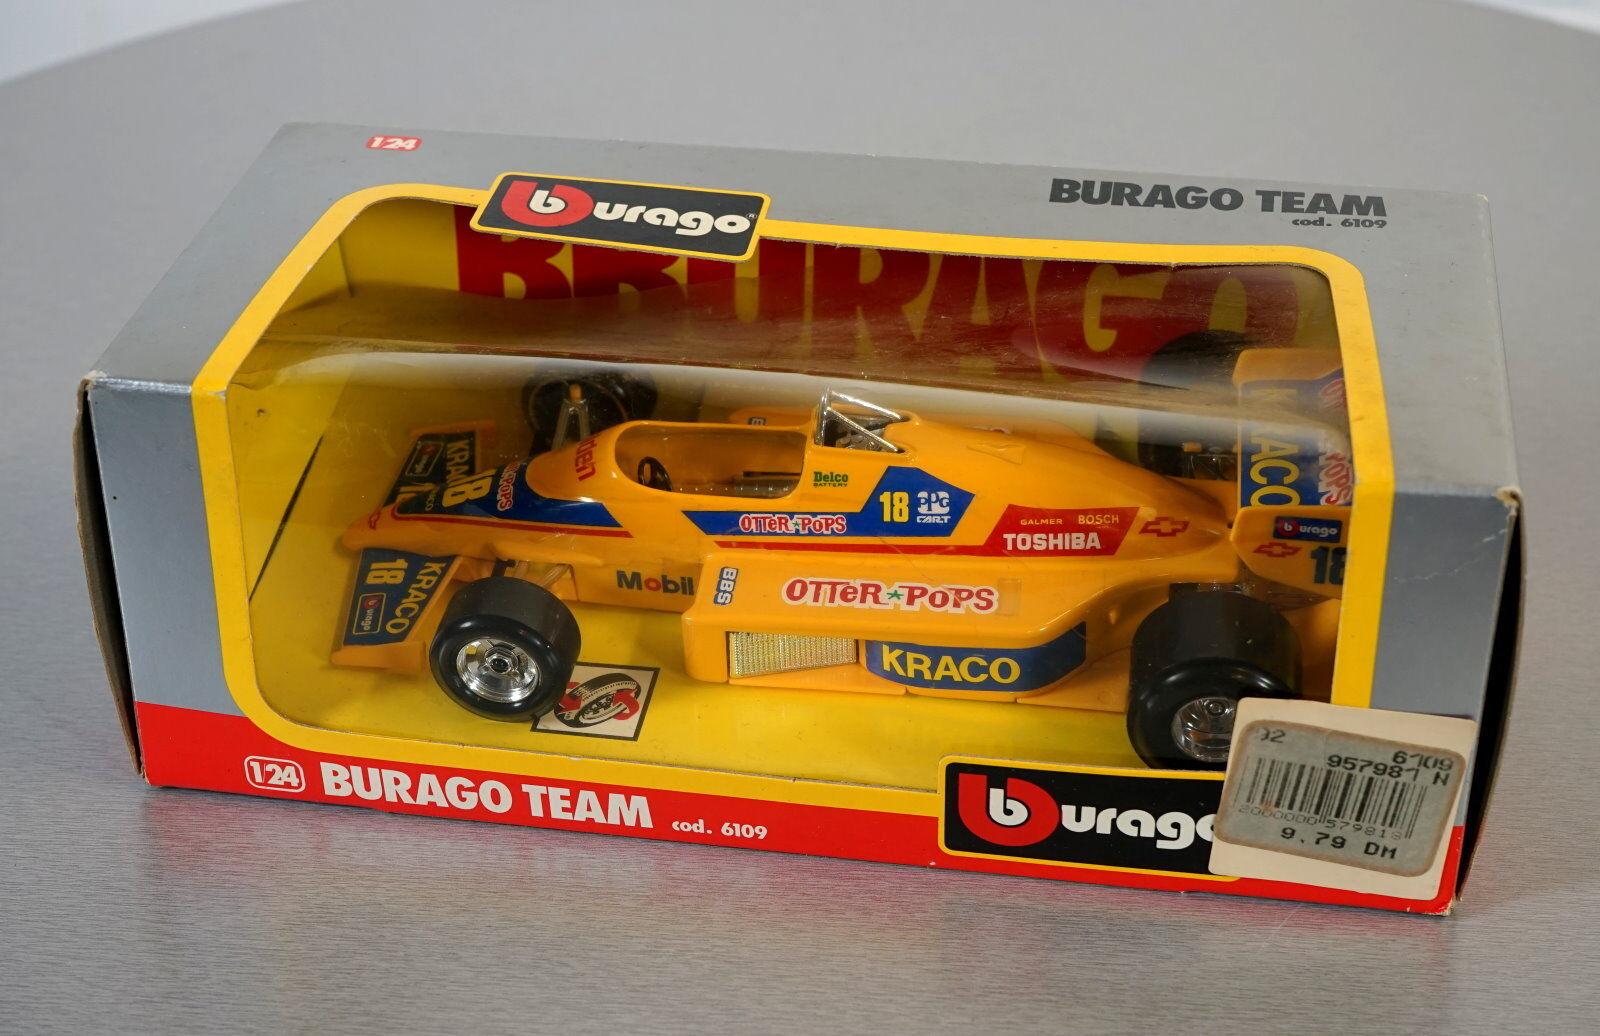 Burago 1 1 1 24 Burago Team - 6109 - Die-Cast Racing Car Scale Modell Auto NEU OVP f33160